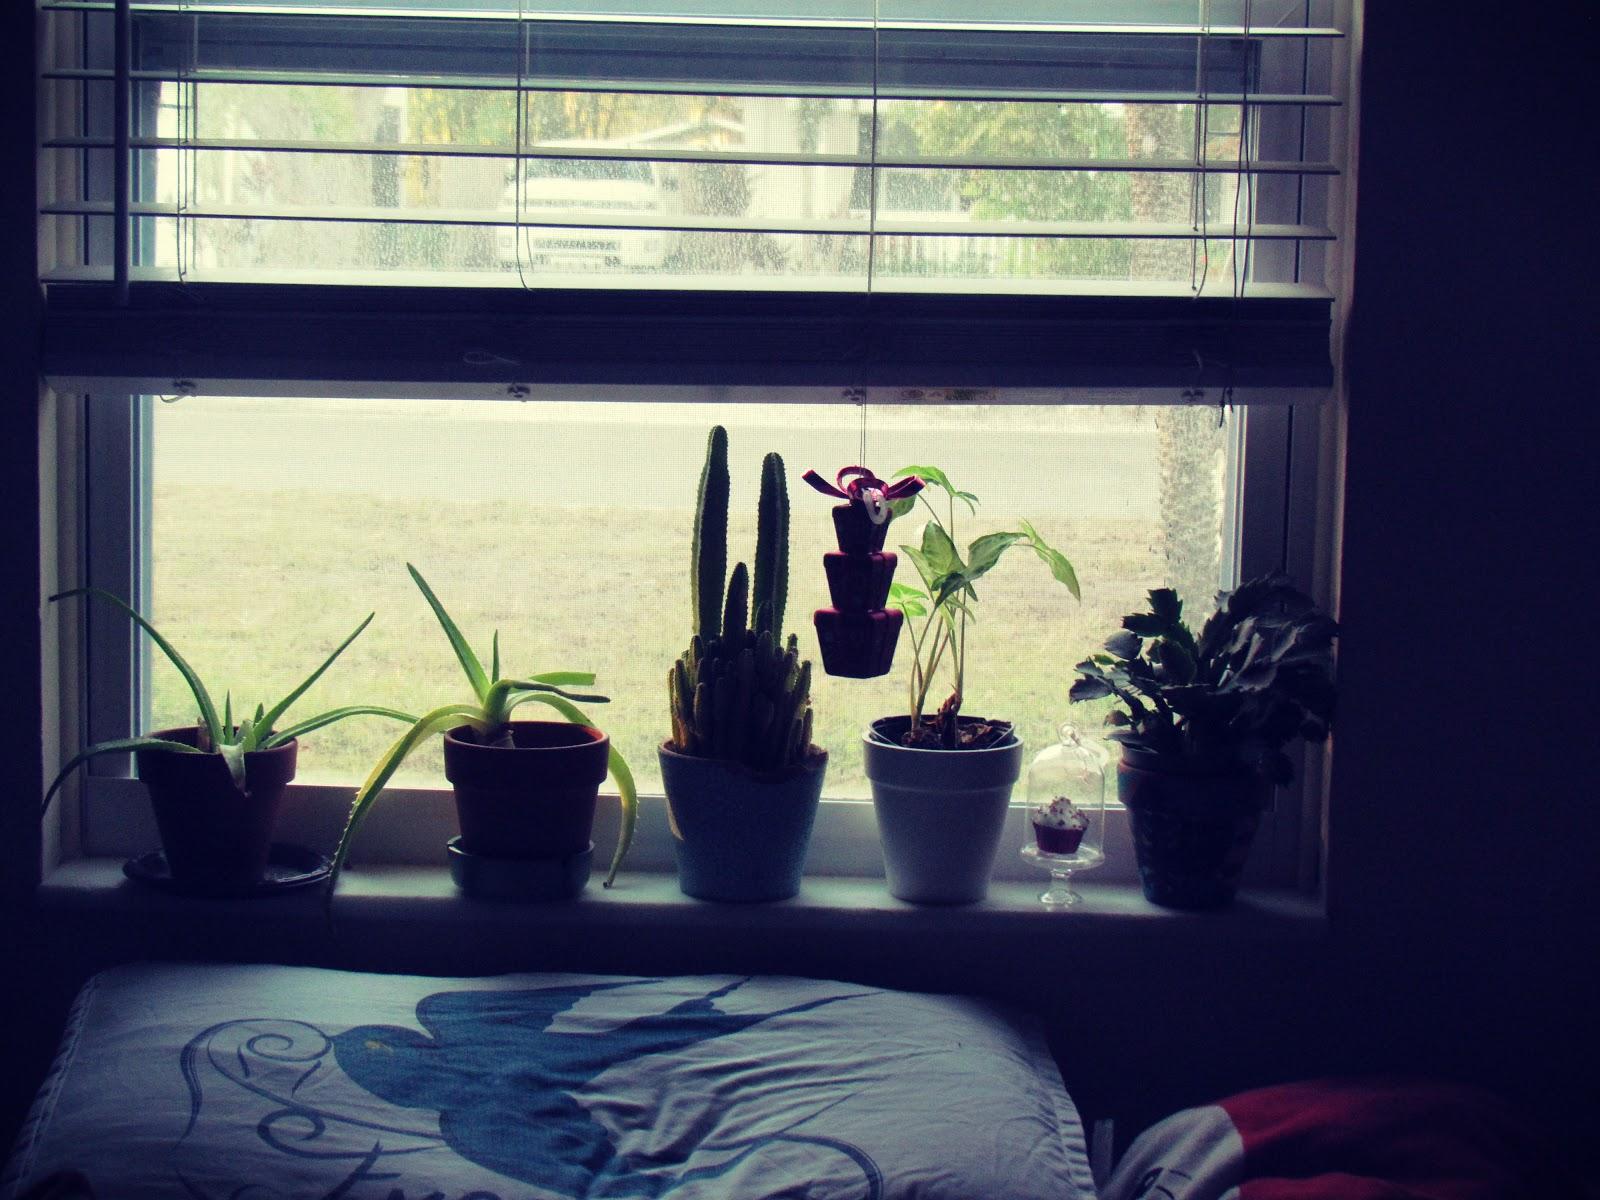 A windowsill plant garden in winter, Christmas cactus plant, aloe vera plant babies, desert rose cactus, nature-inspired home